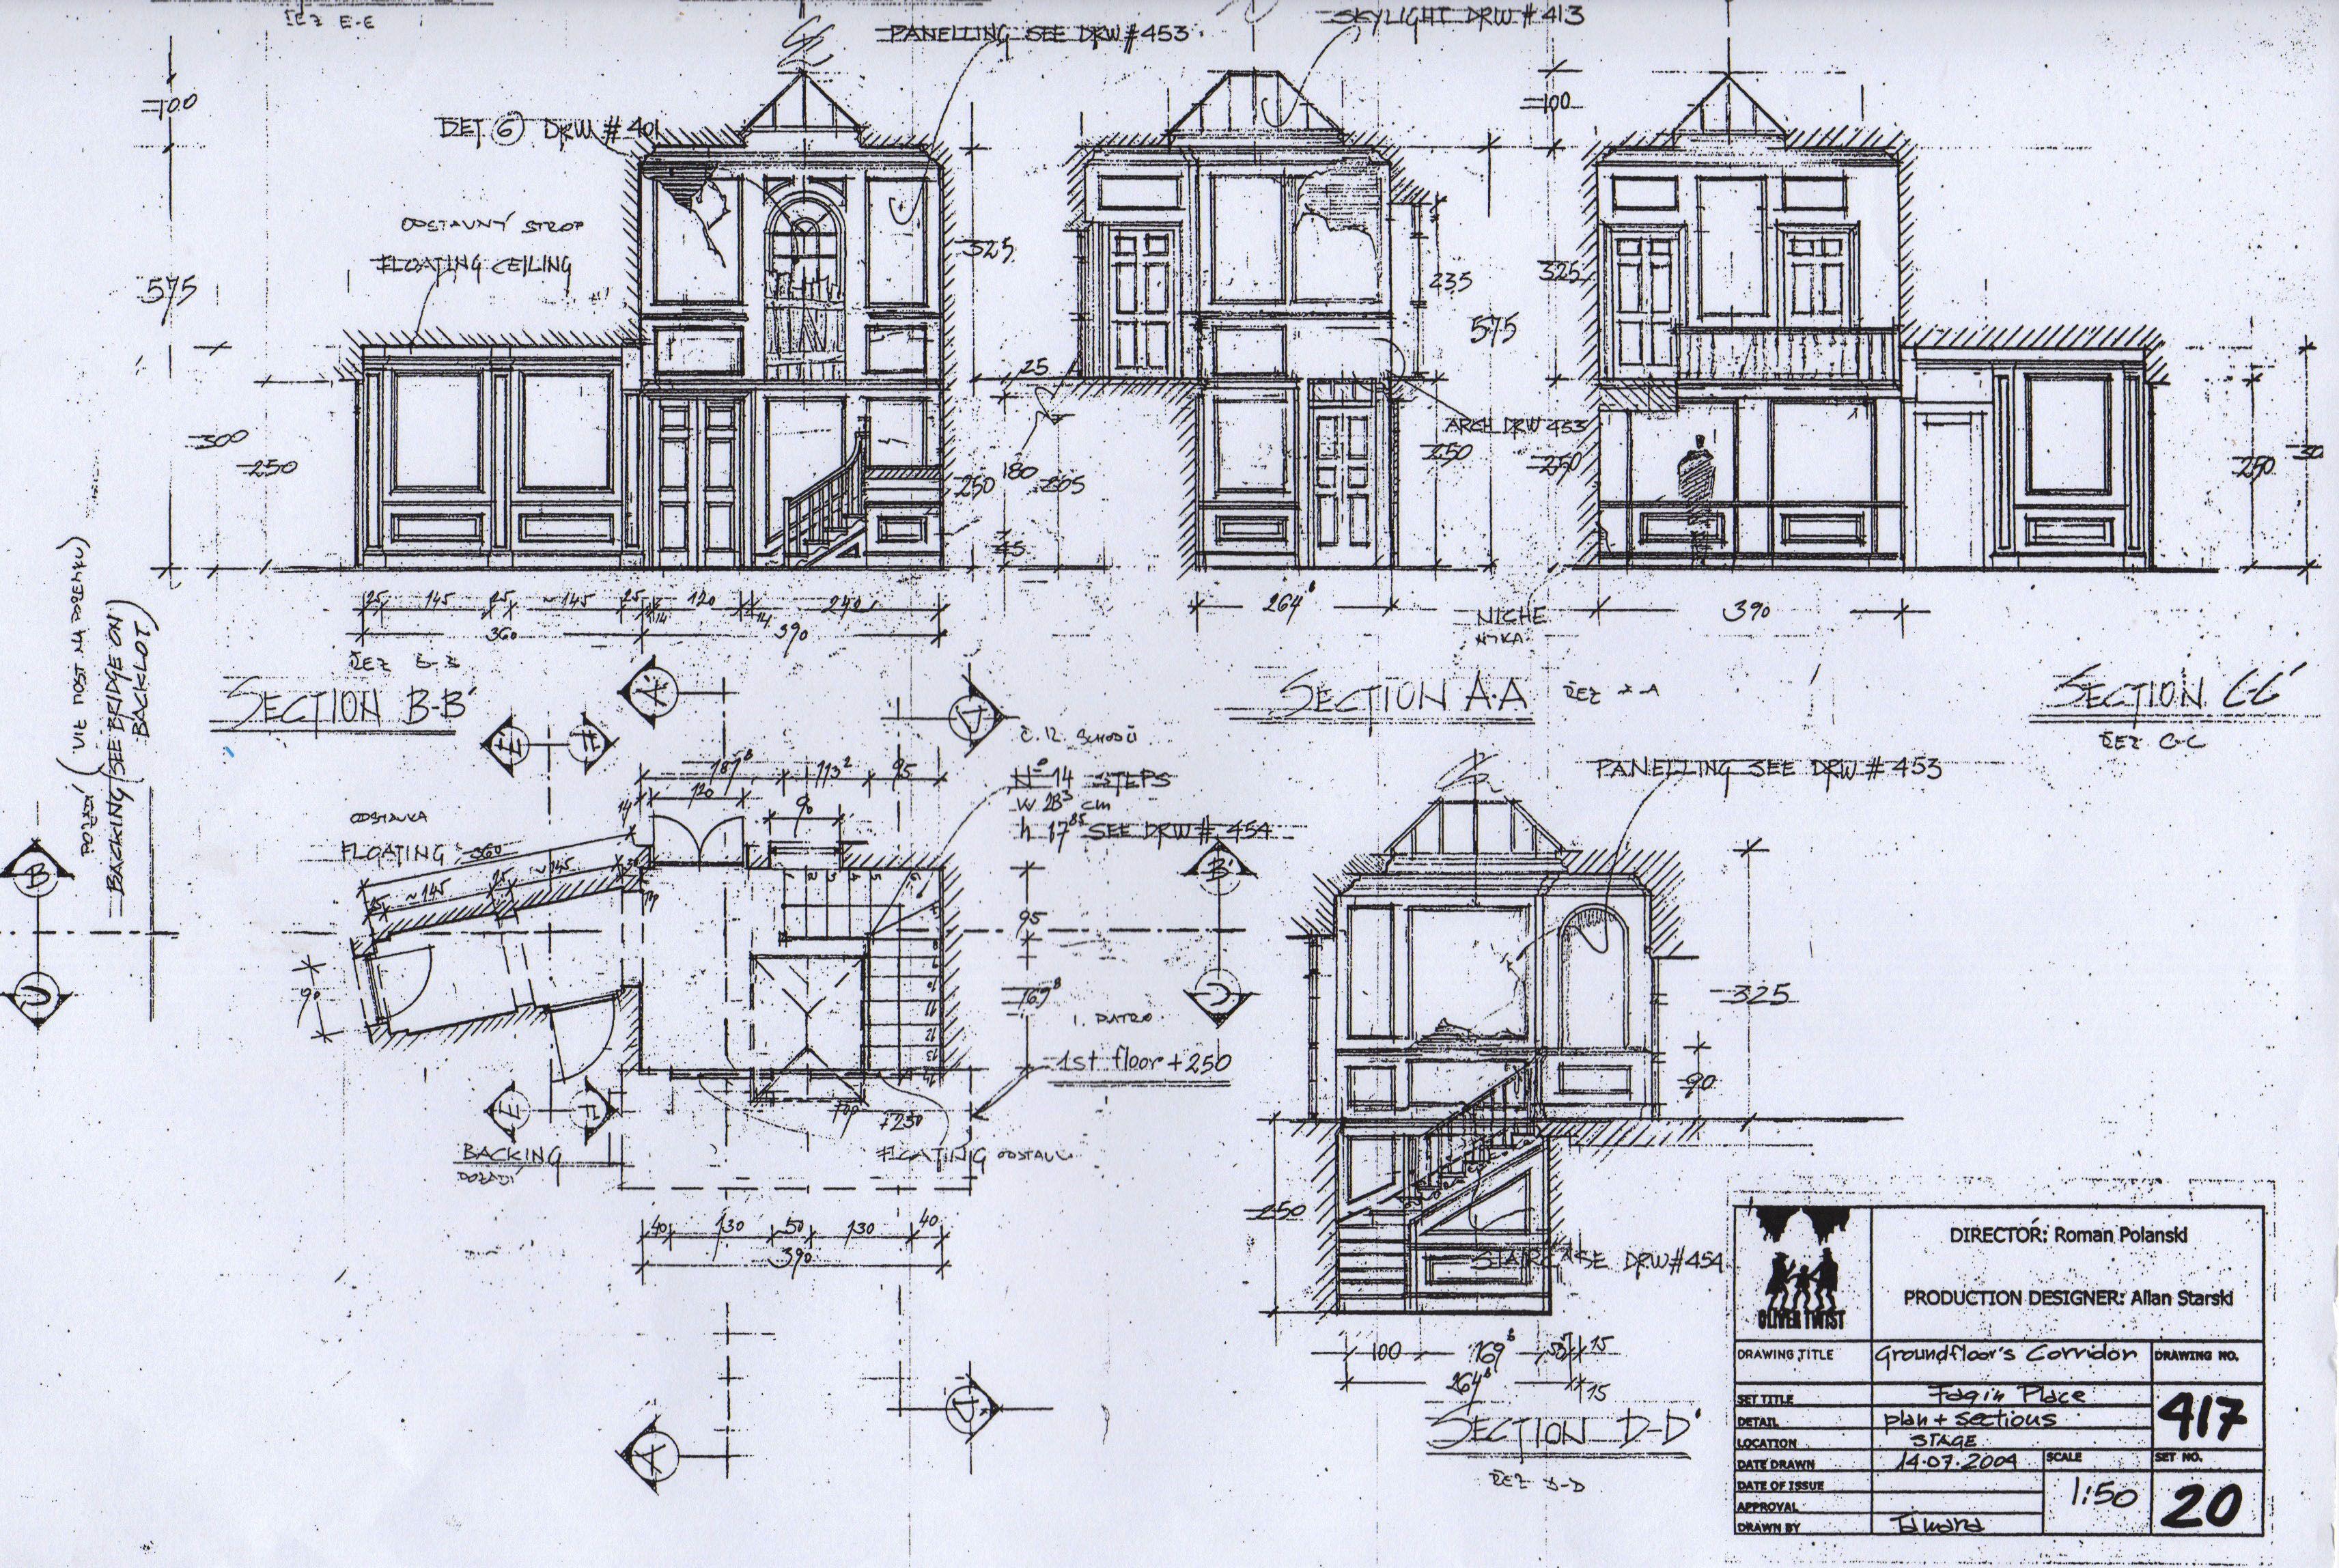 Http Www Tamaramarini Altervista Org Wp Content Gallery Oliver Twist Fagin1 Jpg Design Concept Design Harry Potter Places